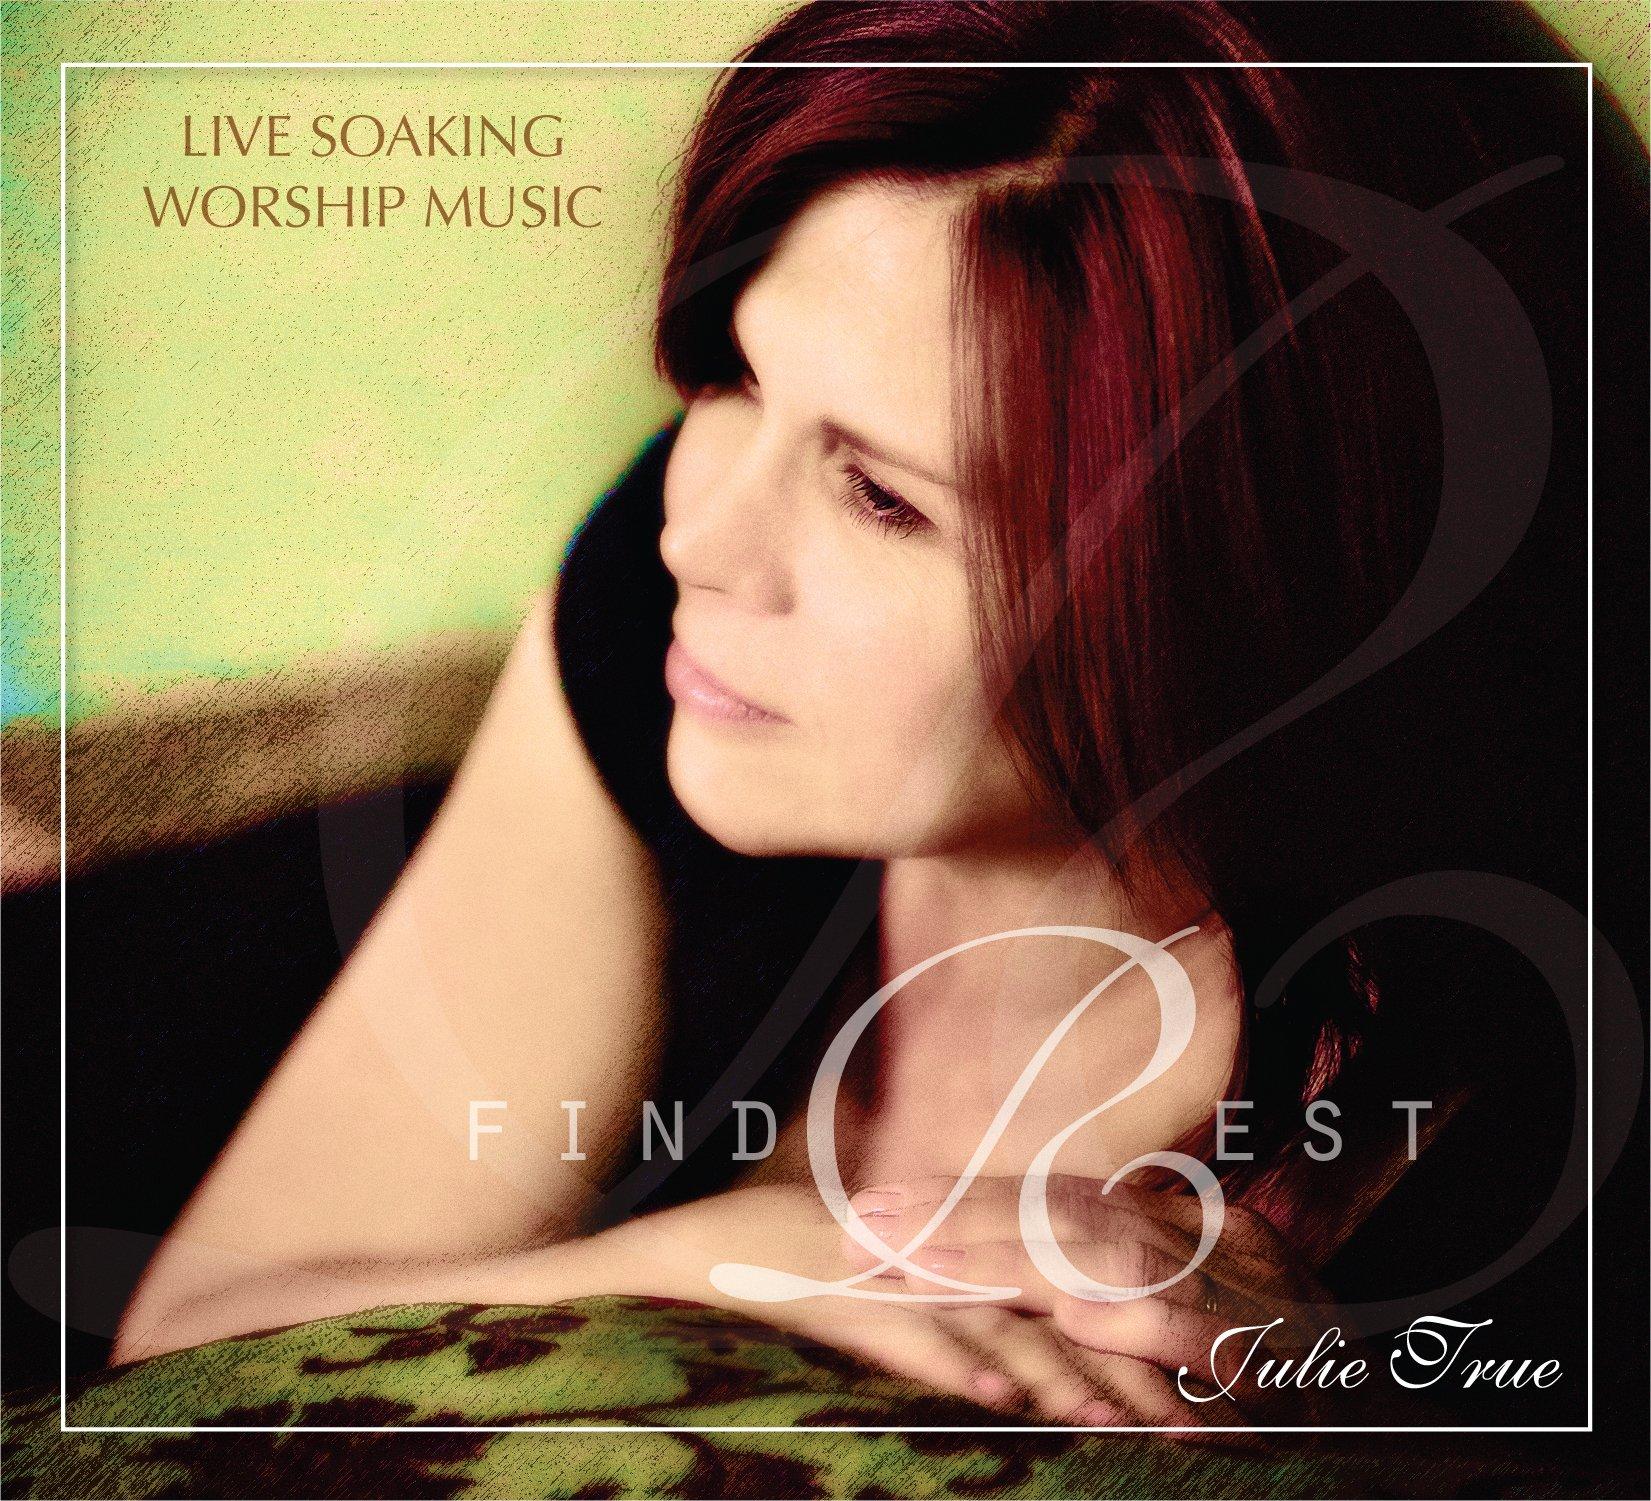 Find Rest - Live Soaking Worship Music